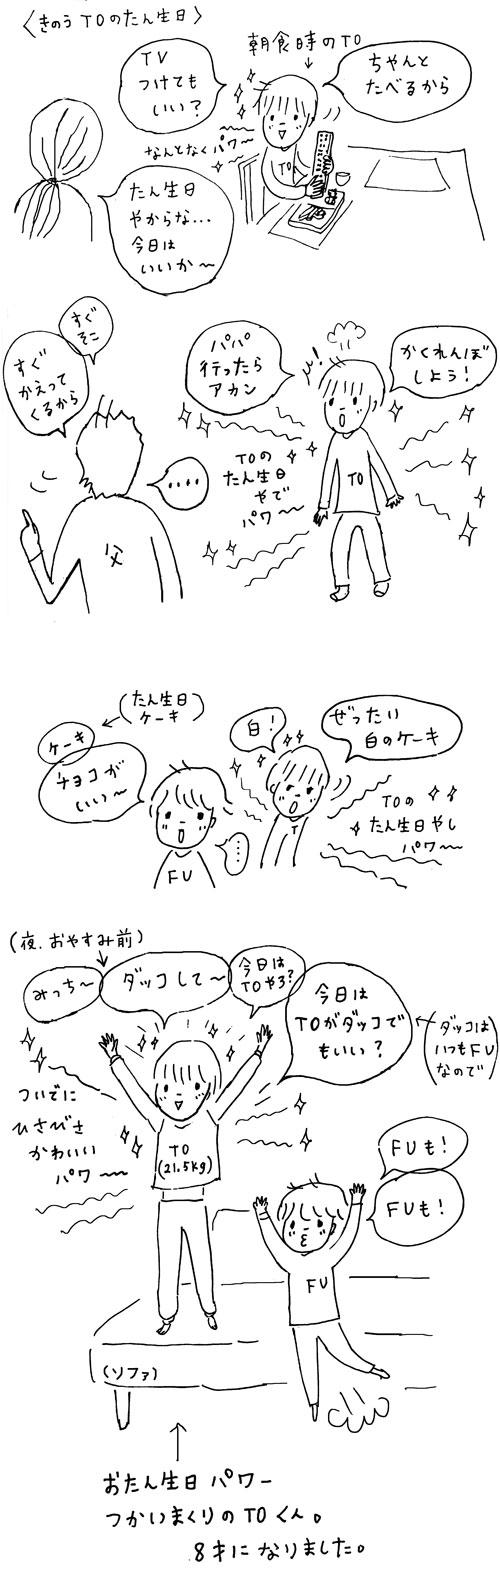 to_1121_1.jpg